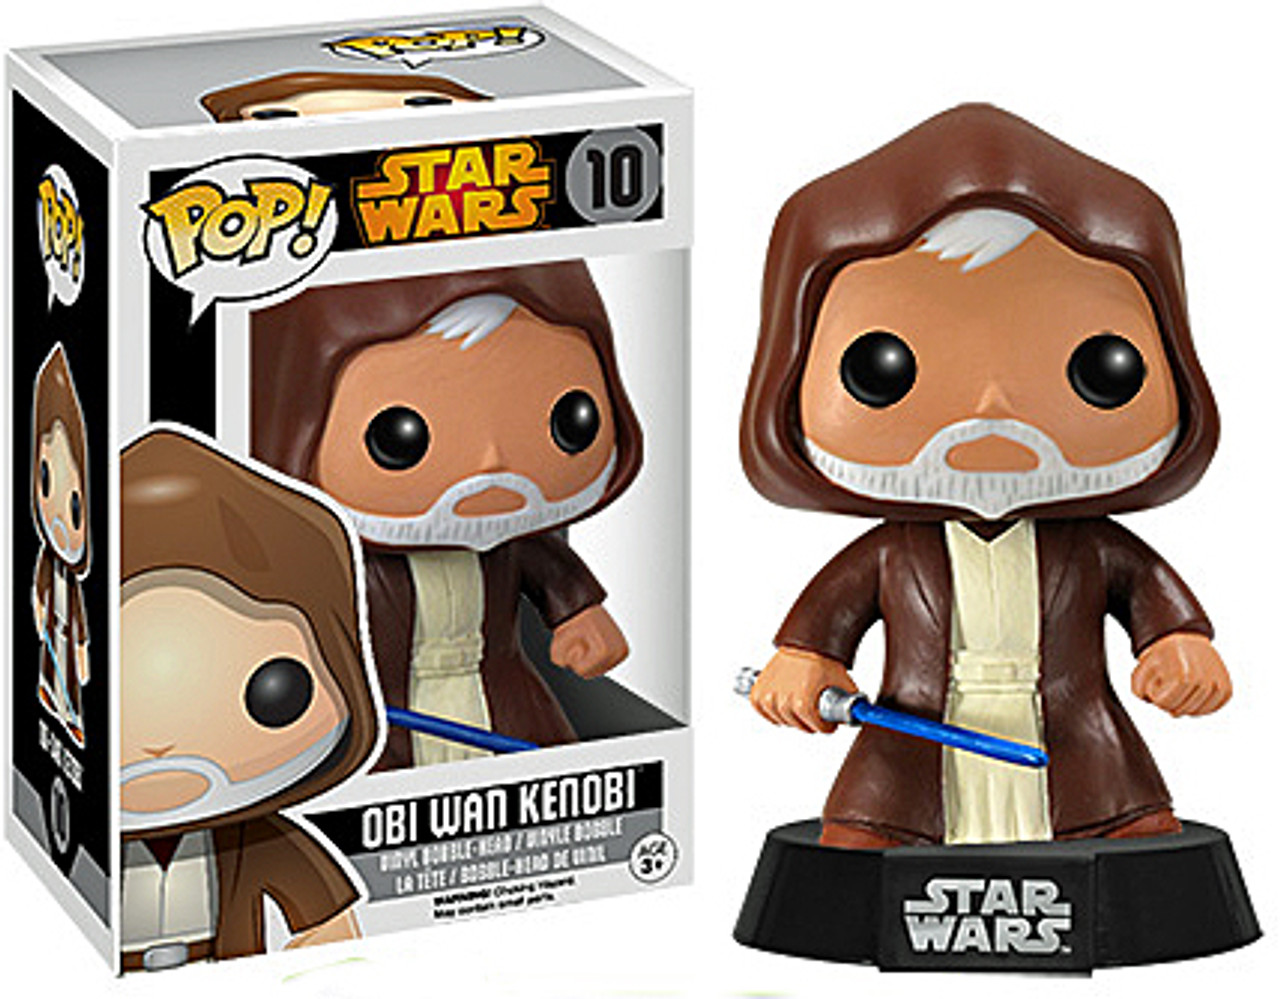 Vinyl Figure #270 The Clone Wars *PRE-ORDER*Star Wars Obi-Wan Kenobi Pop